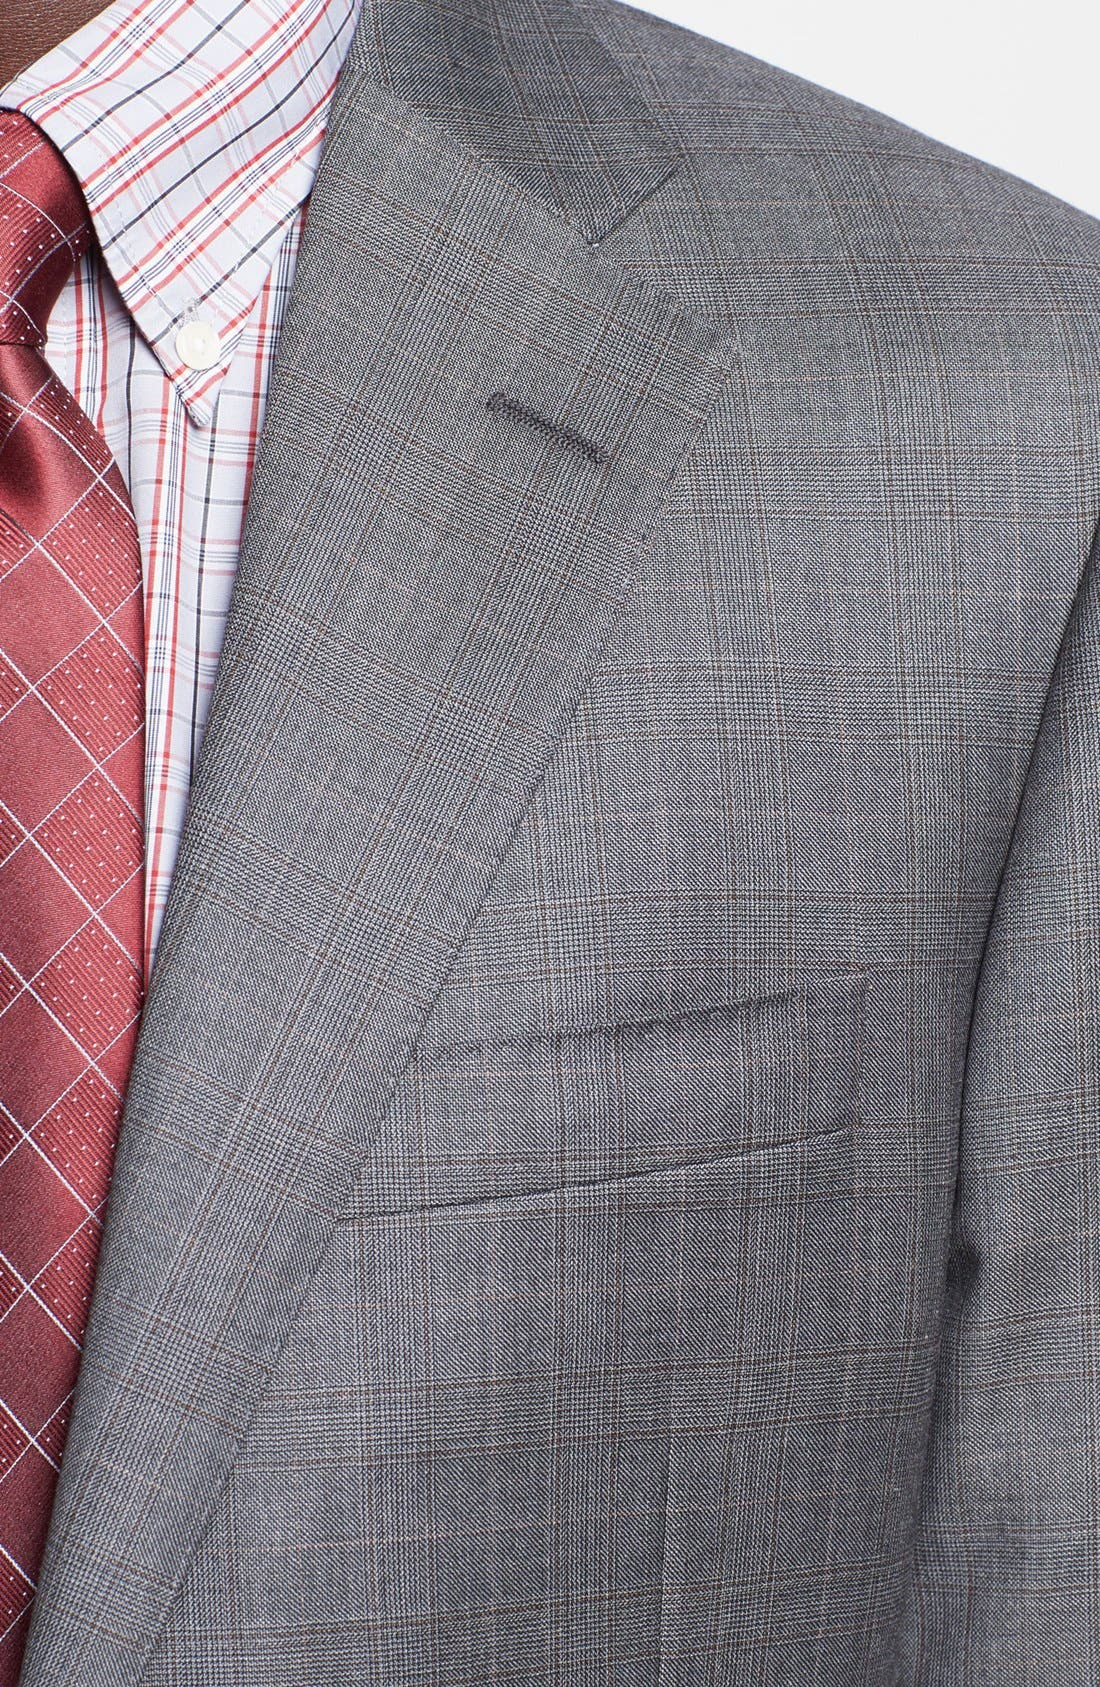 Alternate Image 2  - Hickey Freeman 'B Series' Classic Fit Plaid Suit